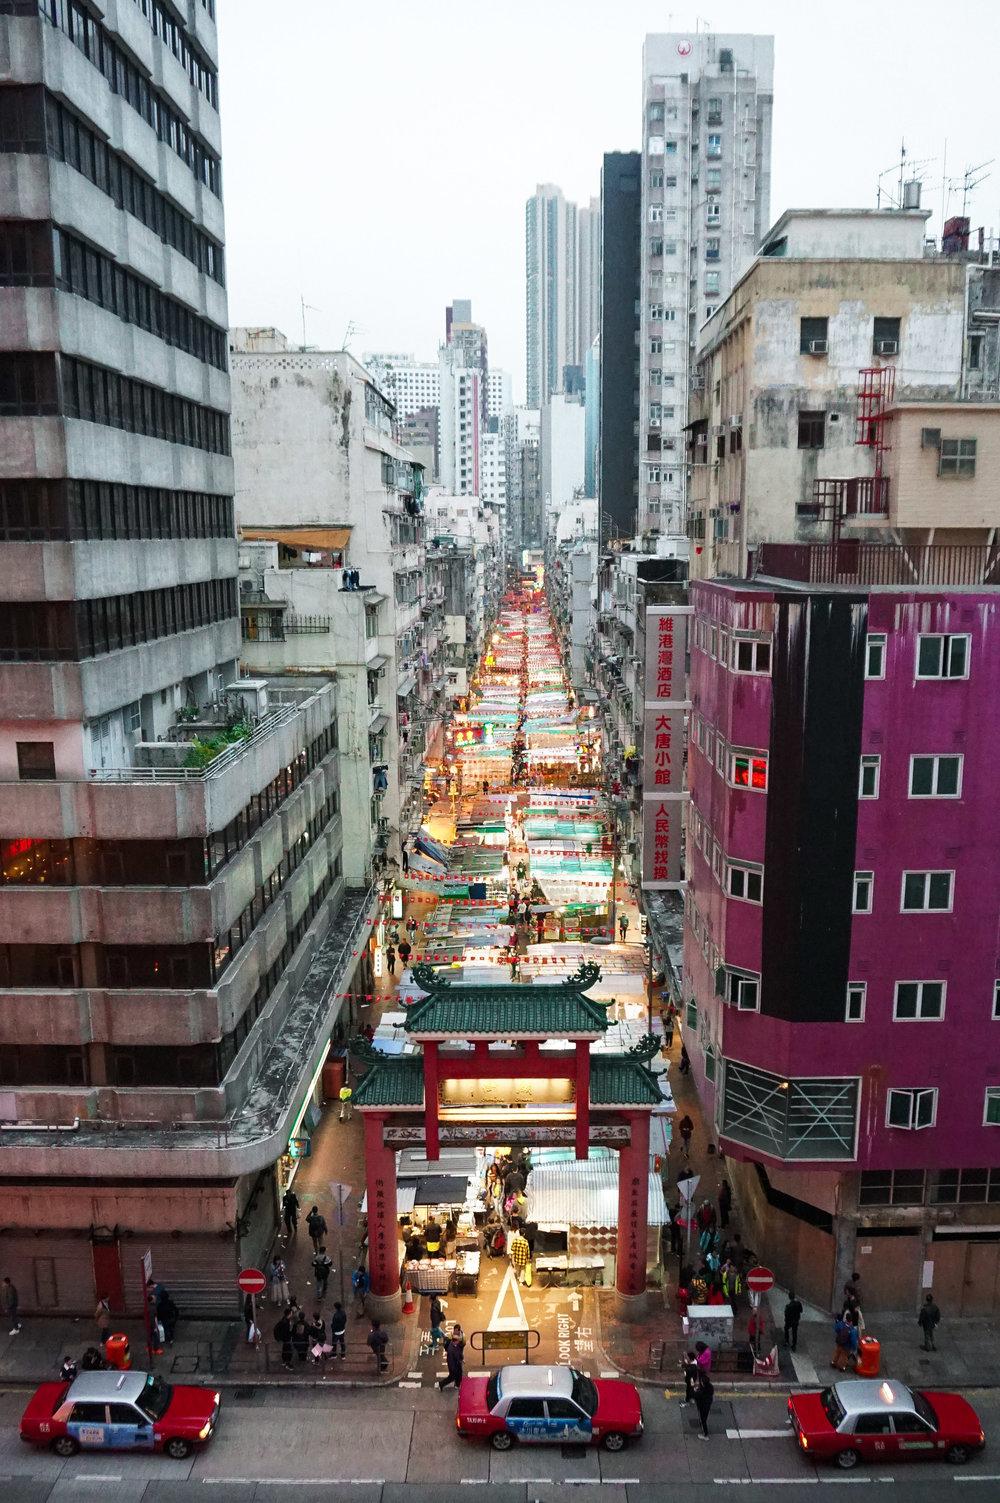 curio.trips.hong.kong.temple.street.night.market.three.taxis.portrait.jpg